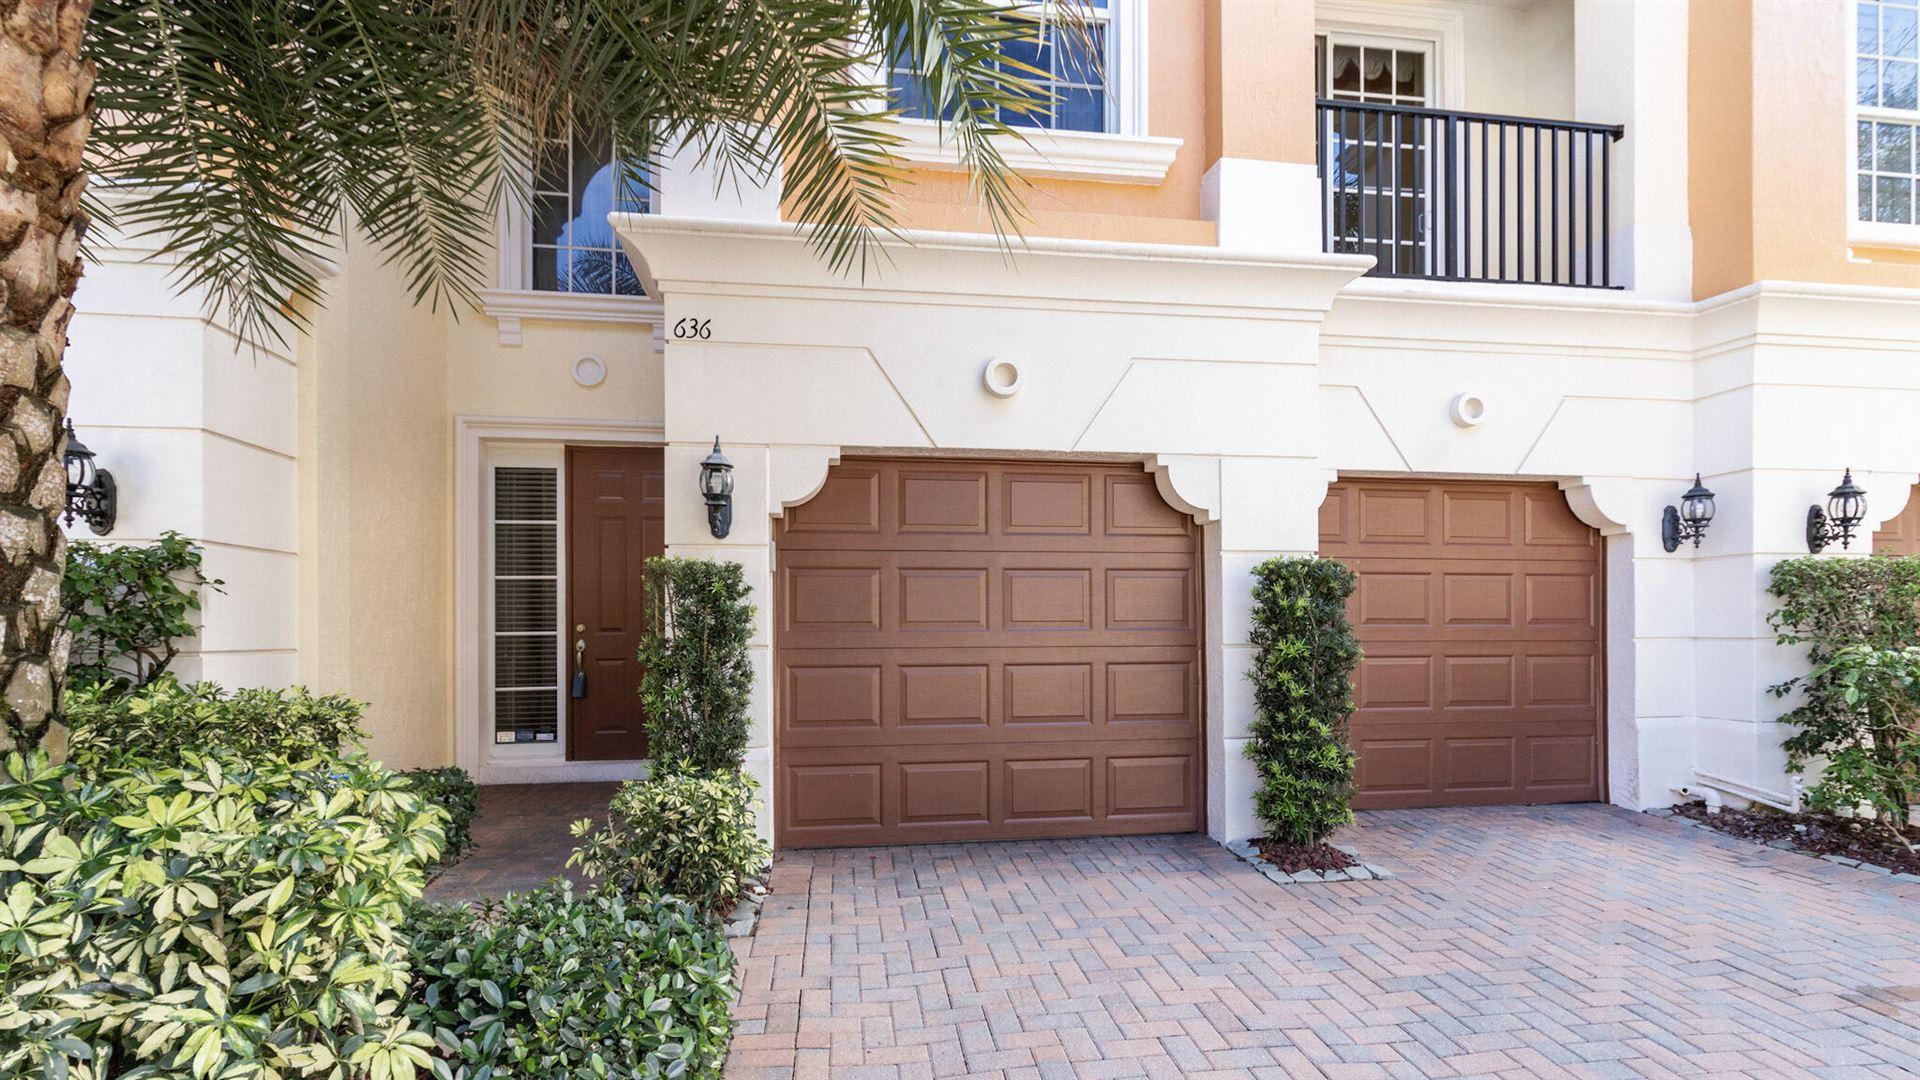 Photo of 636 NE Francesca Lane, Boca Raton, FL 33487 (MLS # RX-10696265)